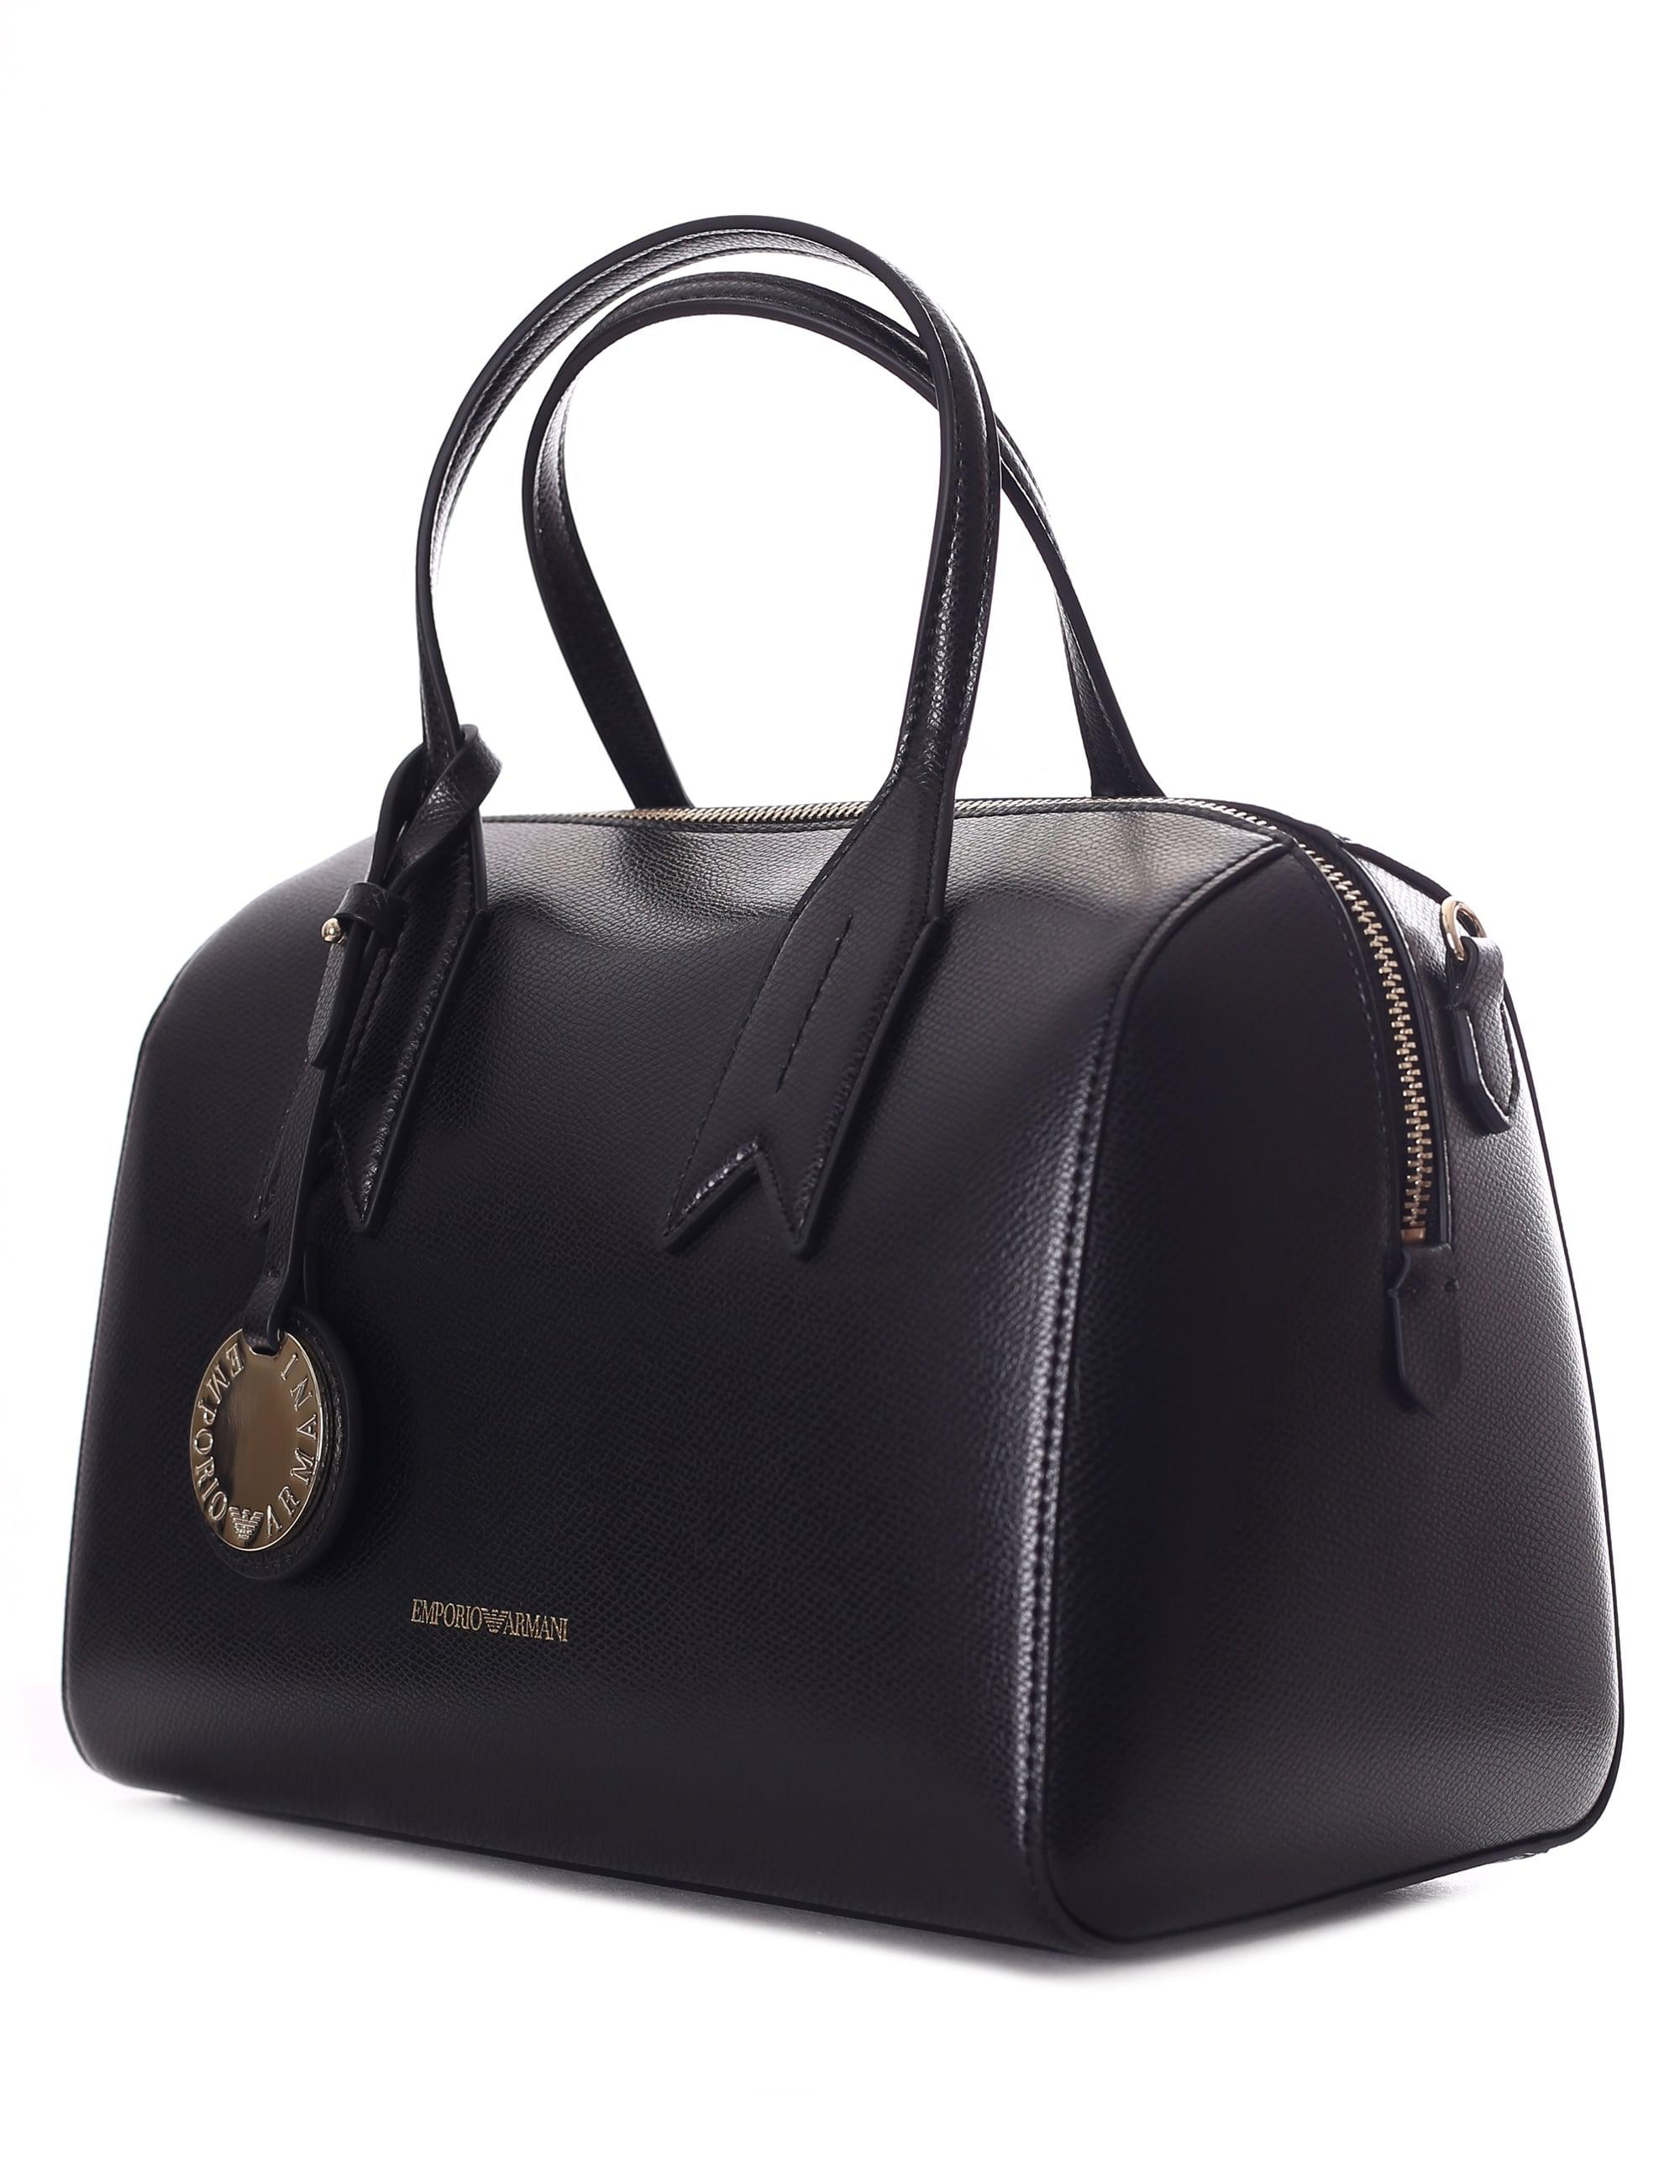 62d9df04ea Emporio Armani Bauletto Bowling Bag in Black - Lyst